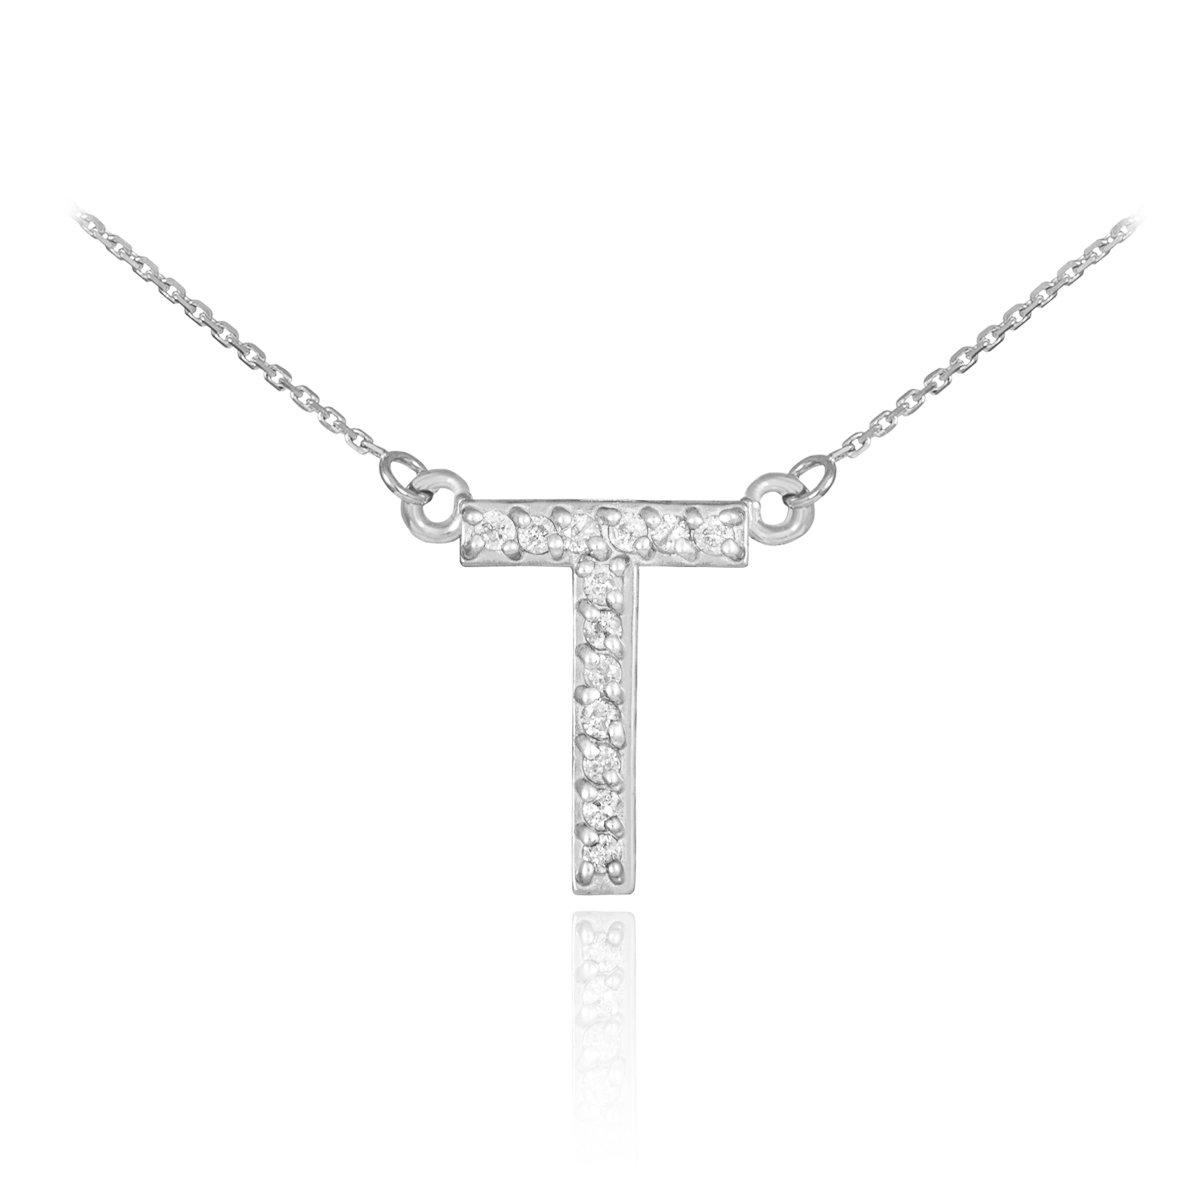 Fine 14k White Gold Diamond-Studded Initial Letter T Pendant Necklace, 20''